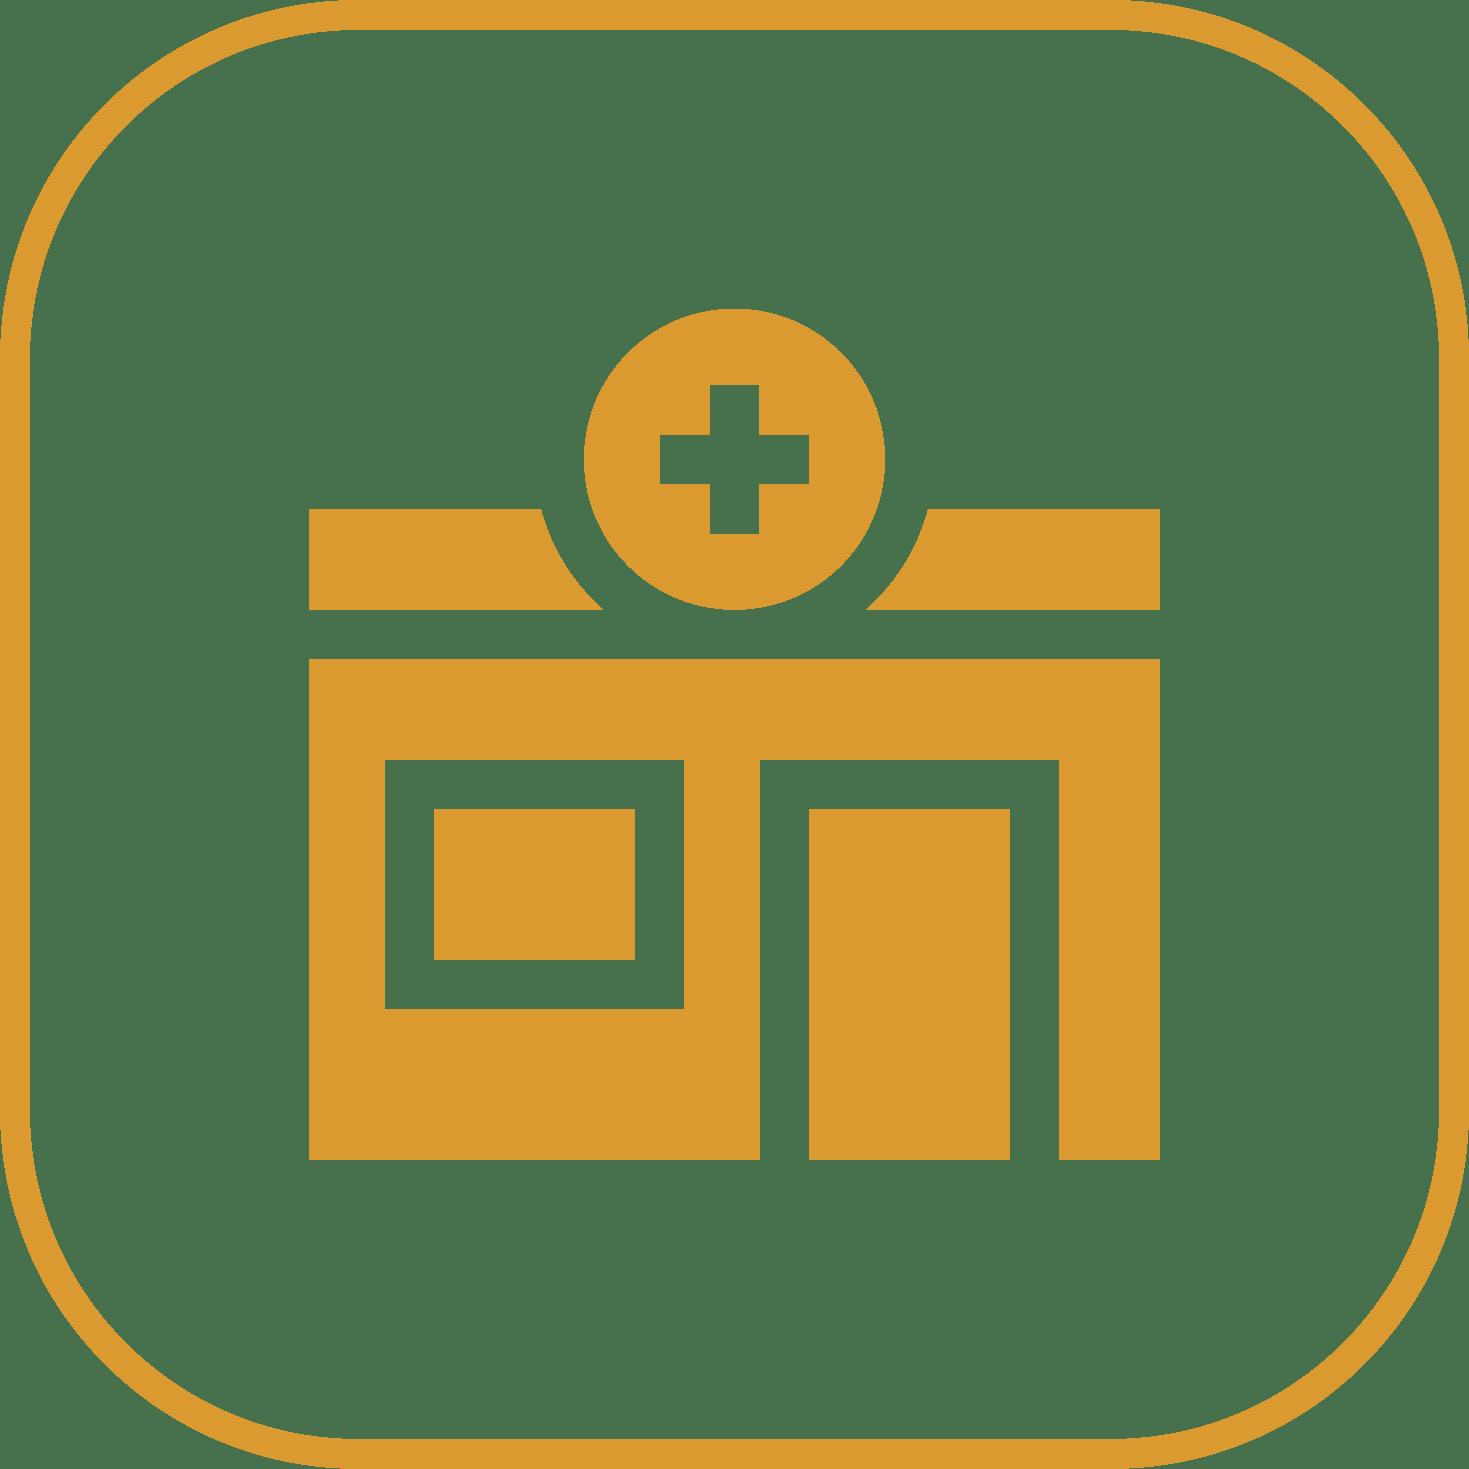 Pesona Remboelan Serpong - Rumah 2 Lantai Cukup DP 34 Juta Langsung Akad 7